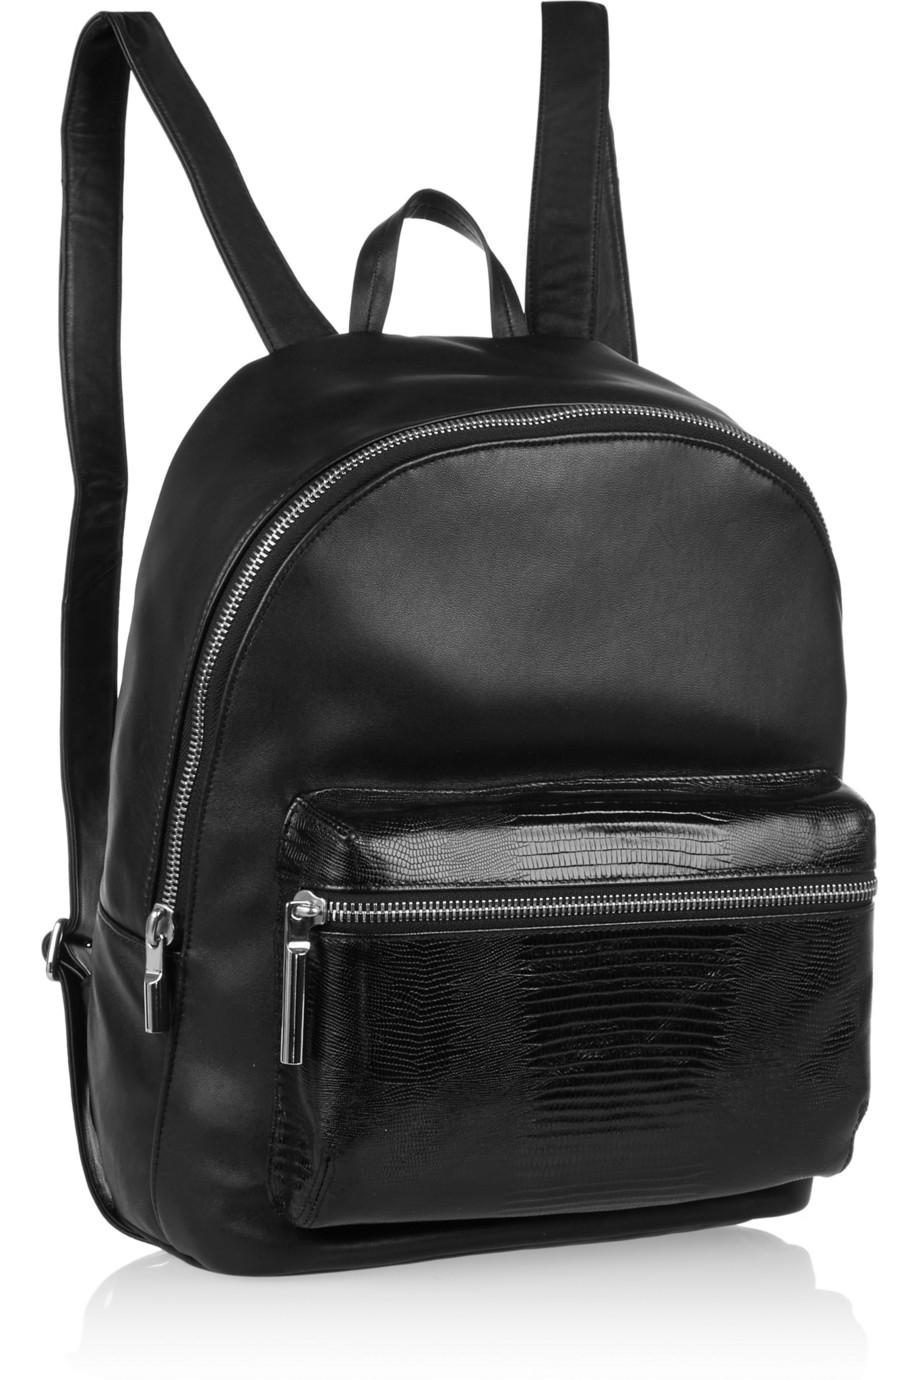 f023294f56 Lyst - Elizabeth and James Cynnie Leather Backpack in Black